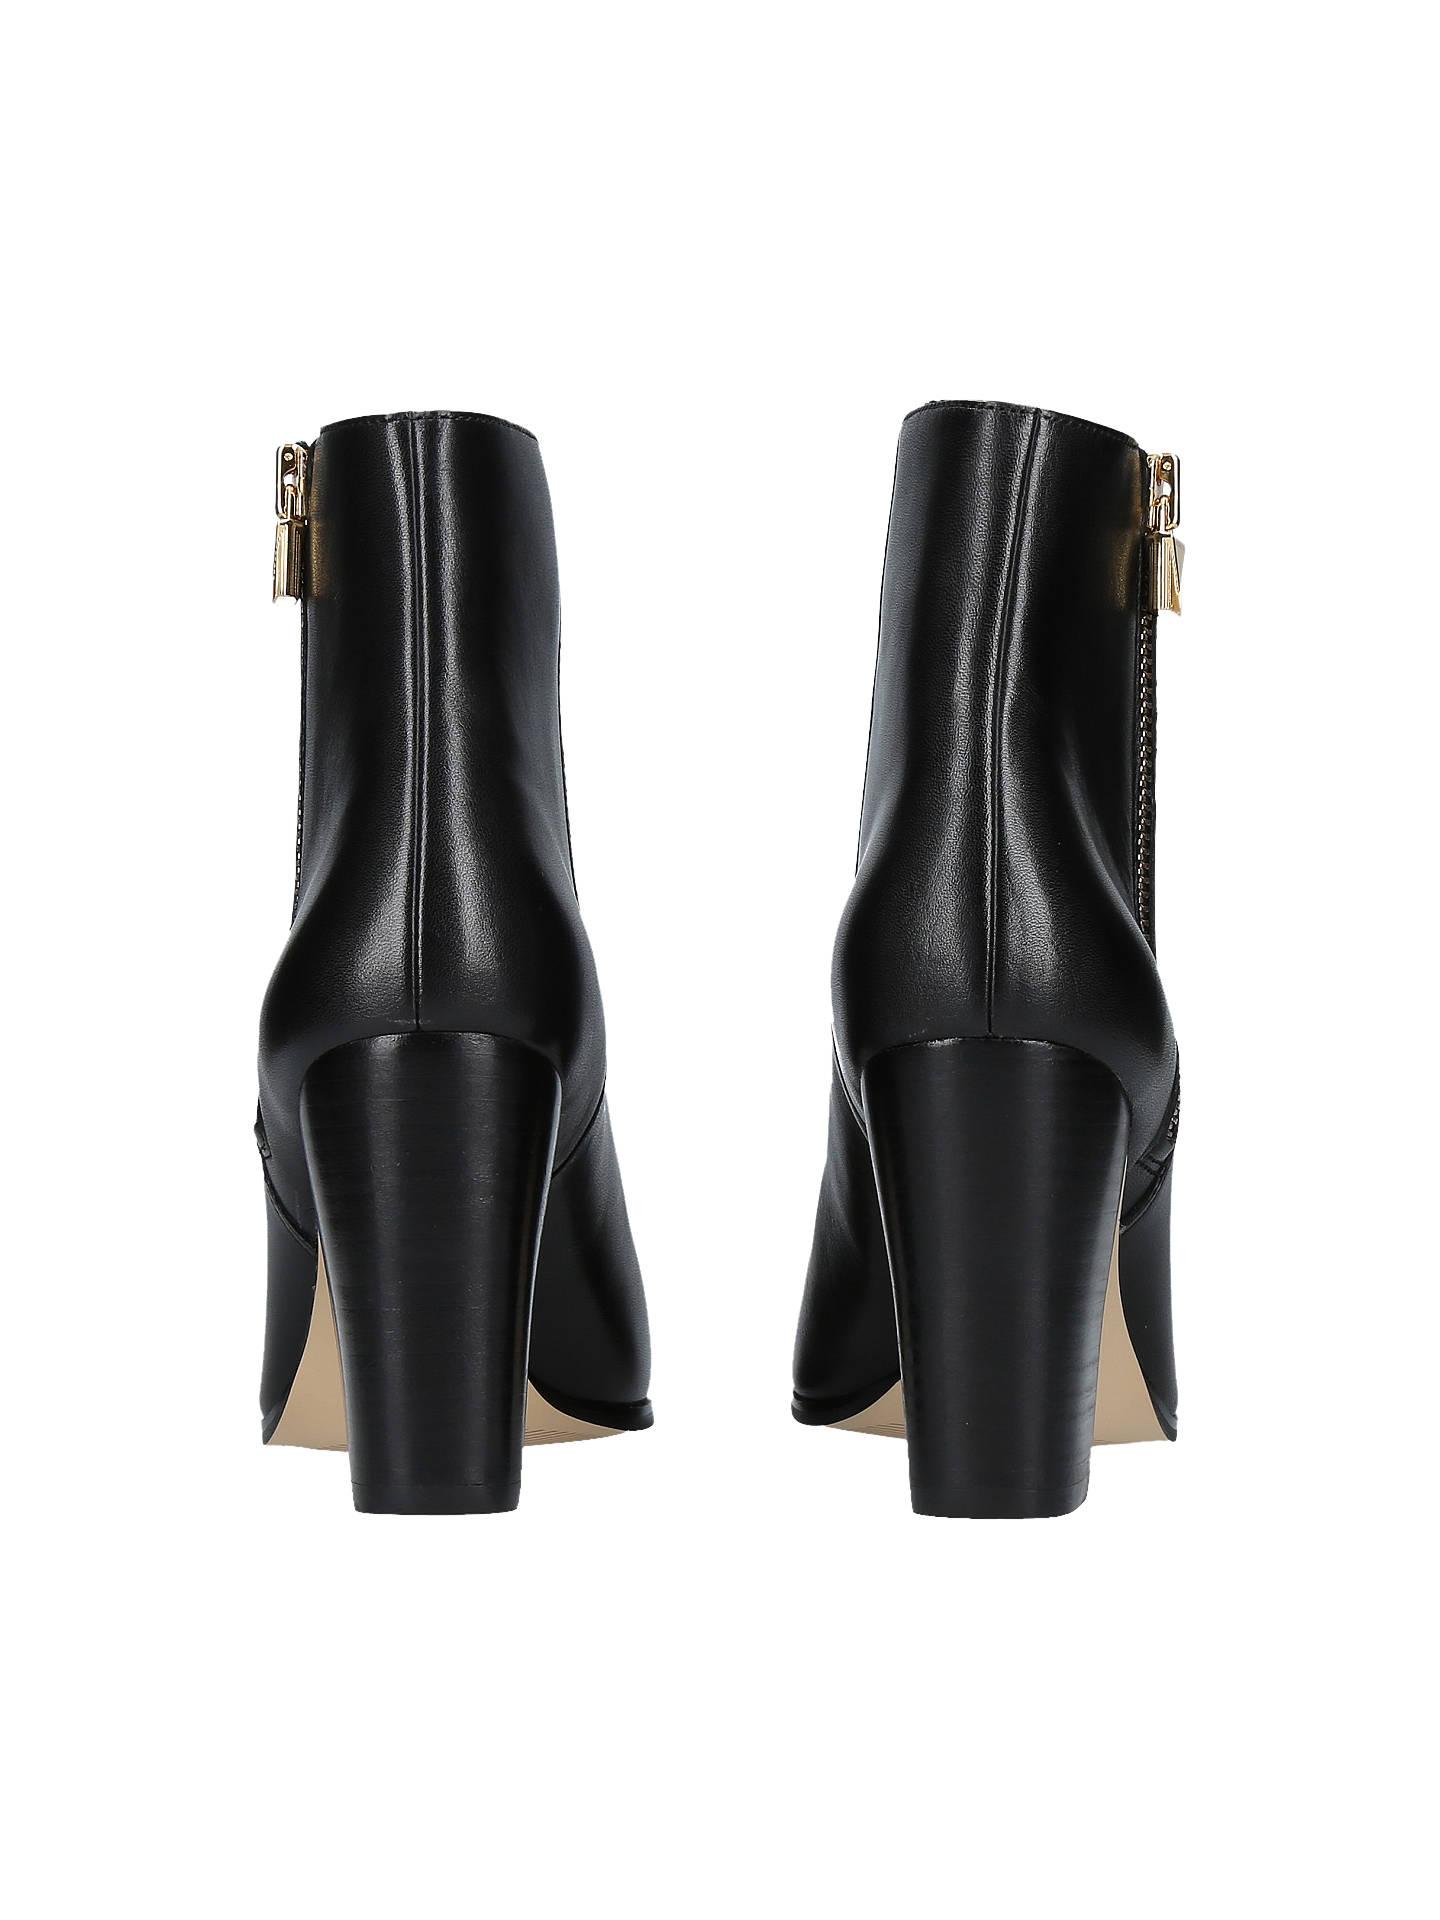 eb7a2f78e4a6 MICHAEL Michael Kors Margaret Block Heel Ankle Boots at John Lewis ...